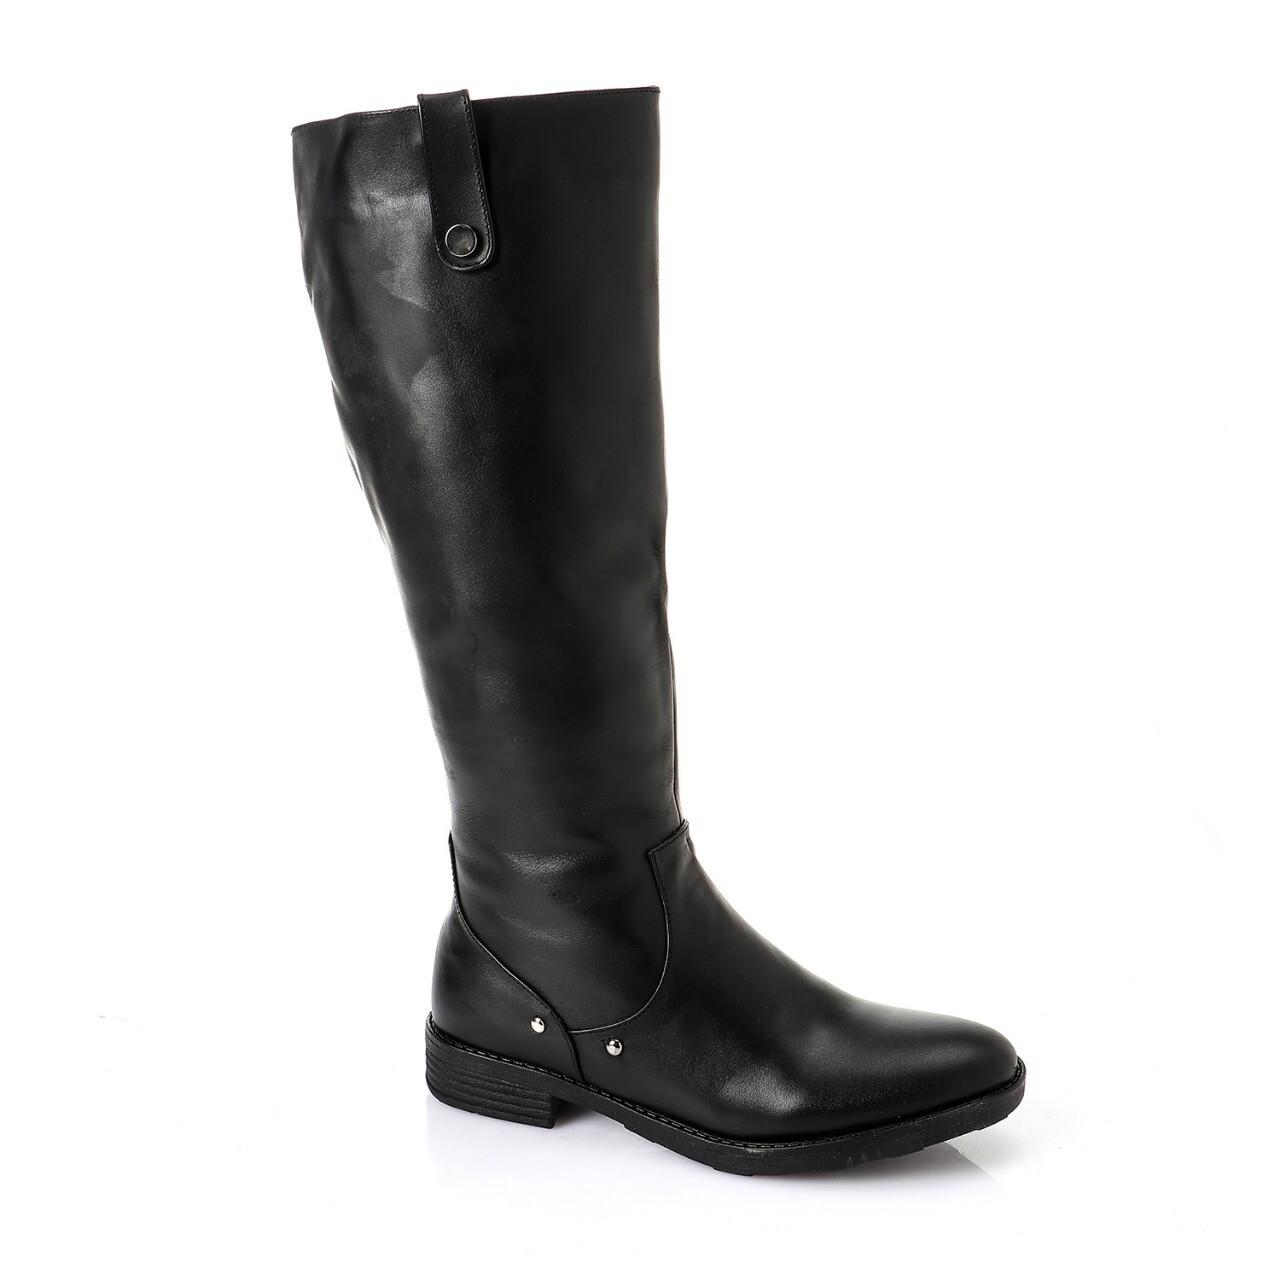 3746 Knee High Boot - Black -جلد طبيعي